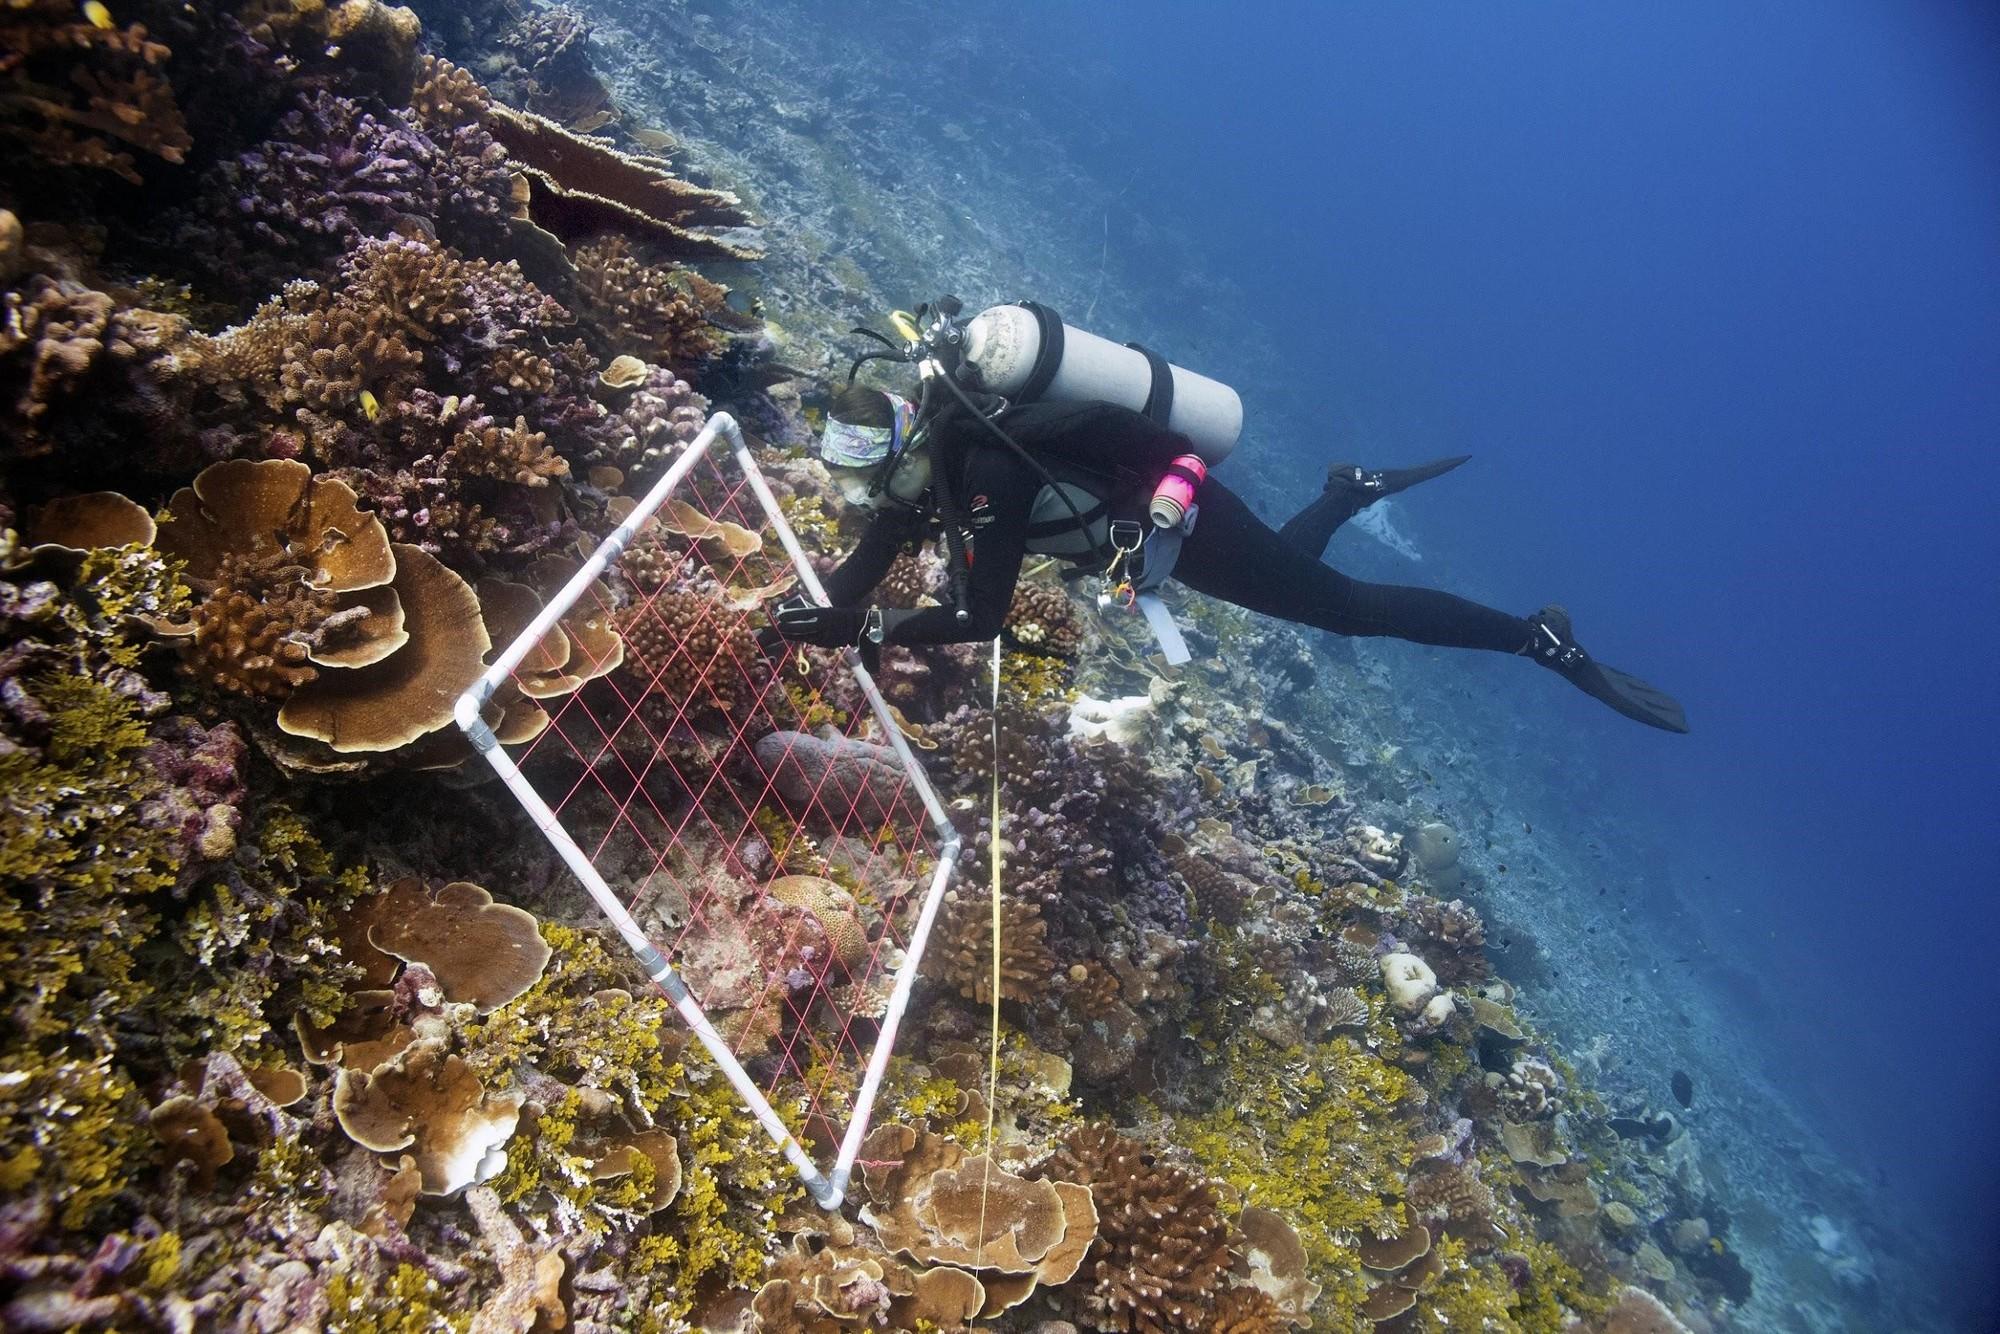 Diver with measuring apparatus.